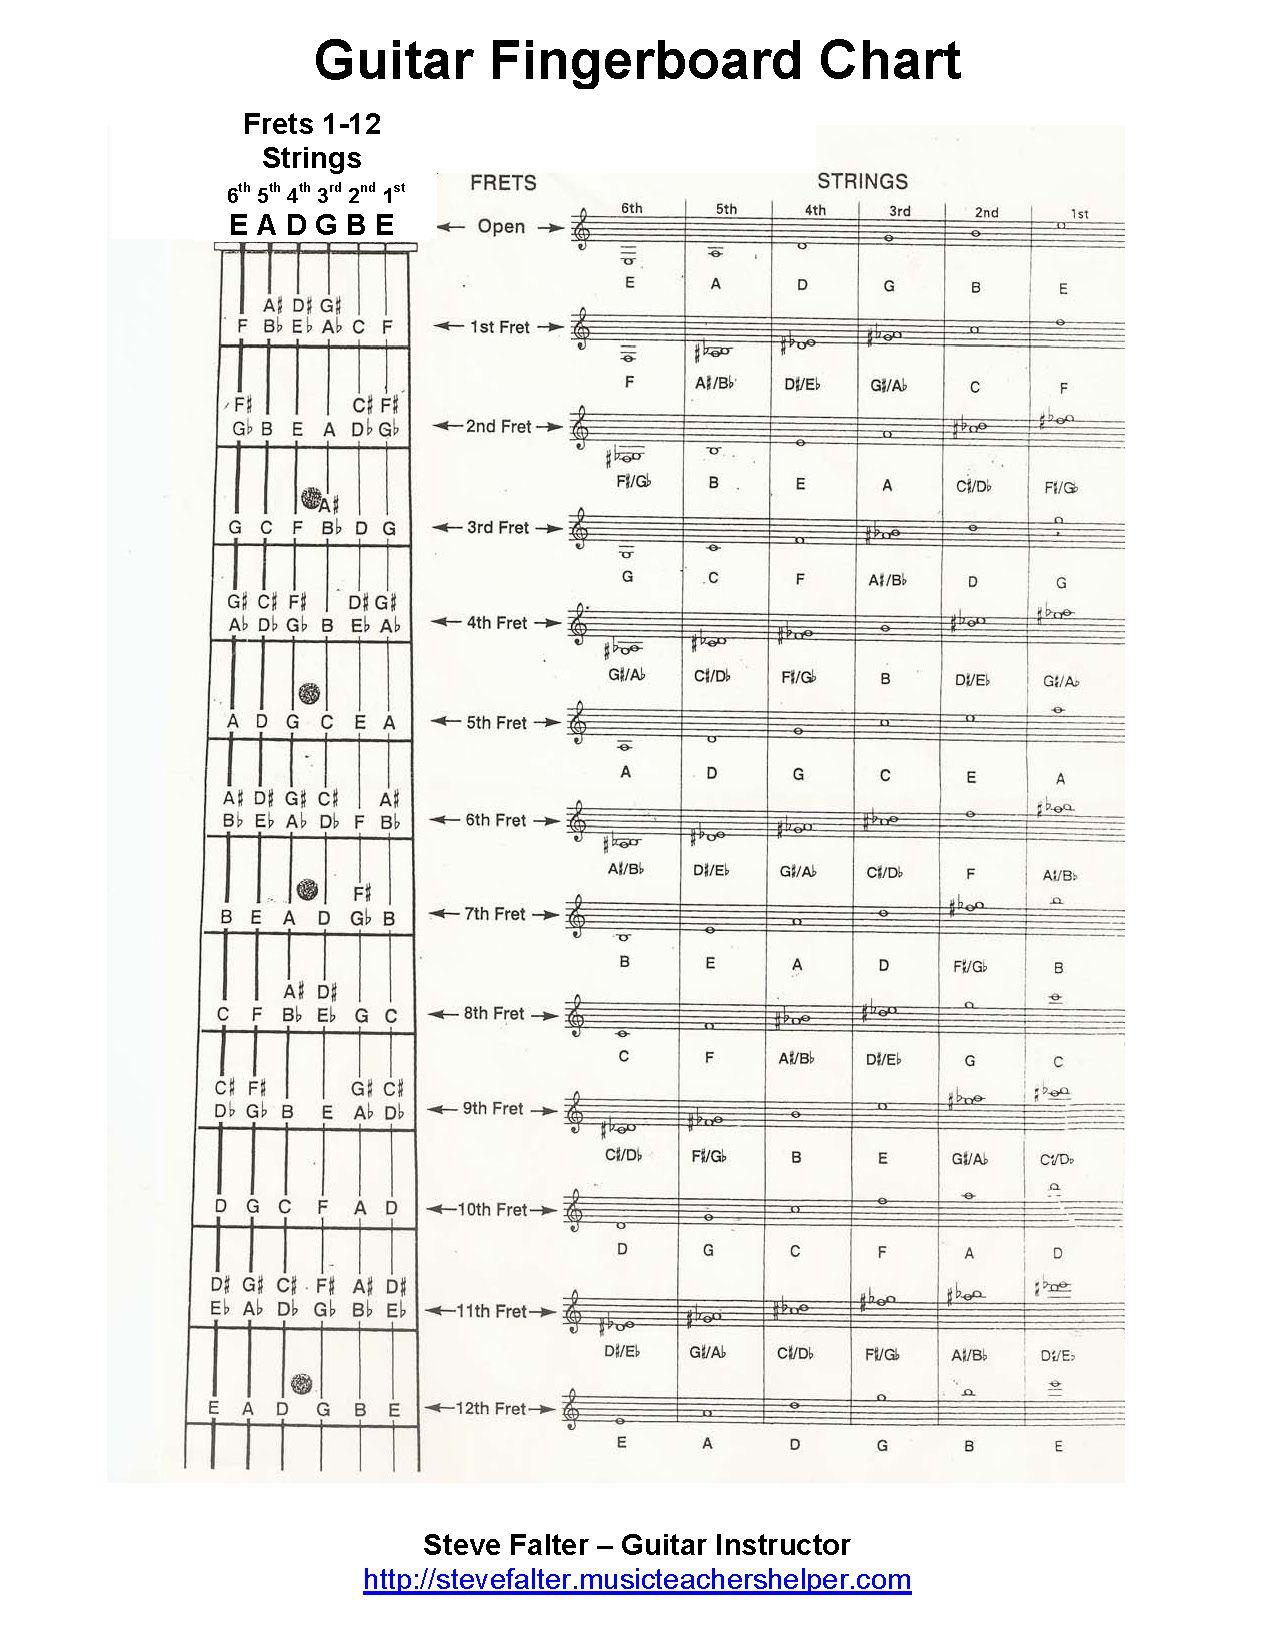 Free Guitar Worksheet The Most Complete Fingerboard